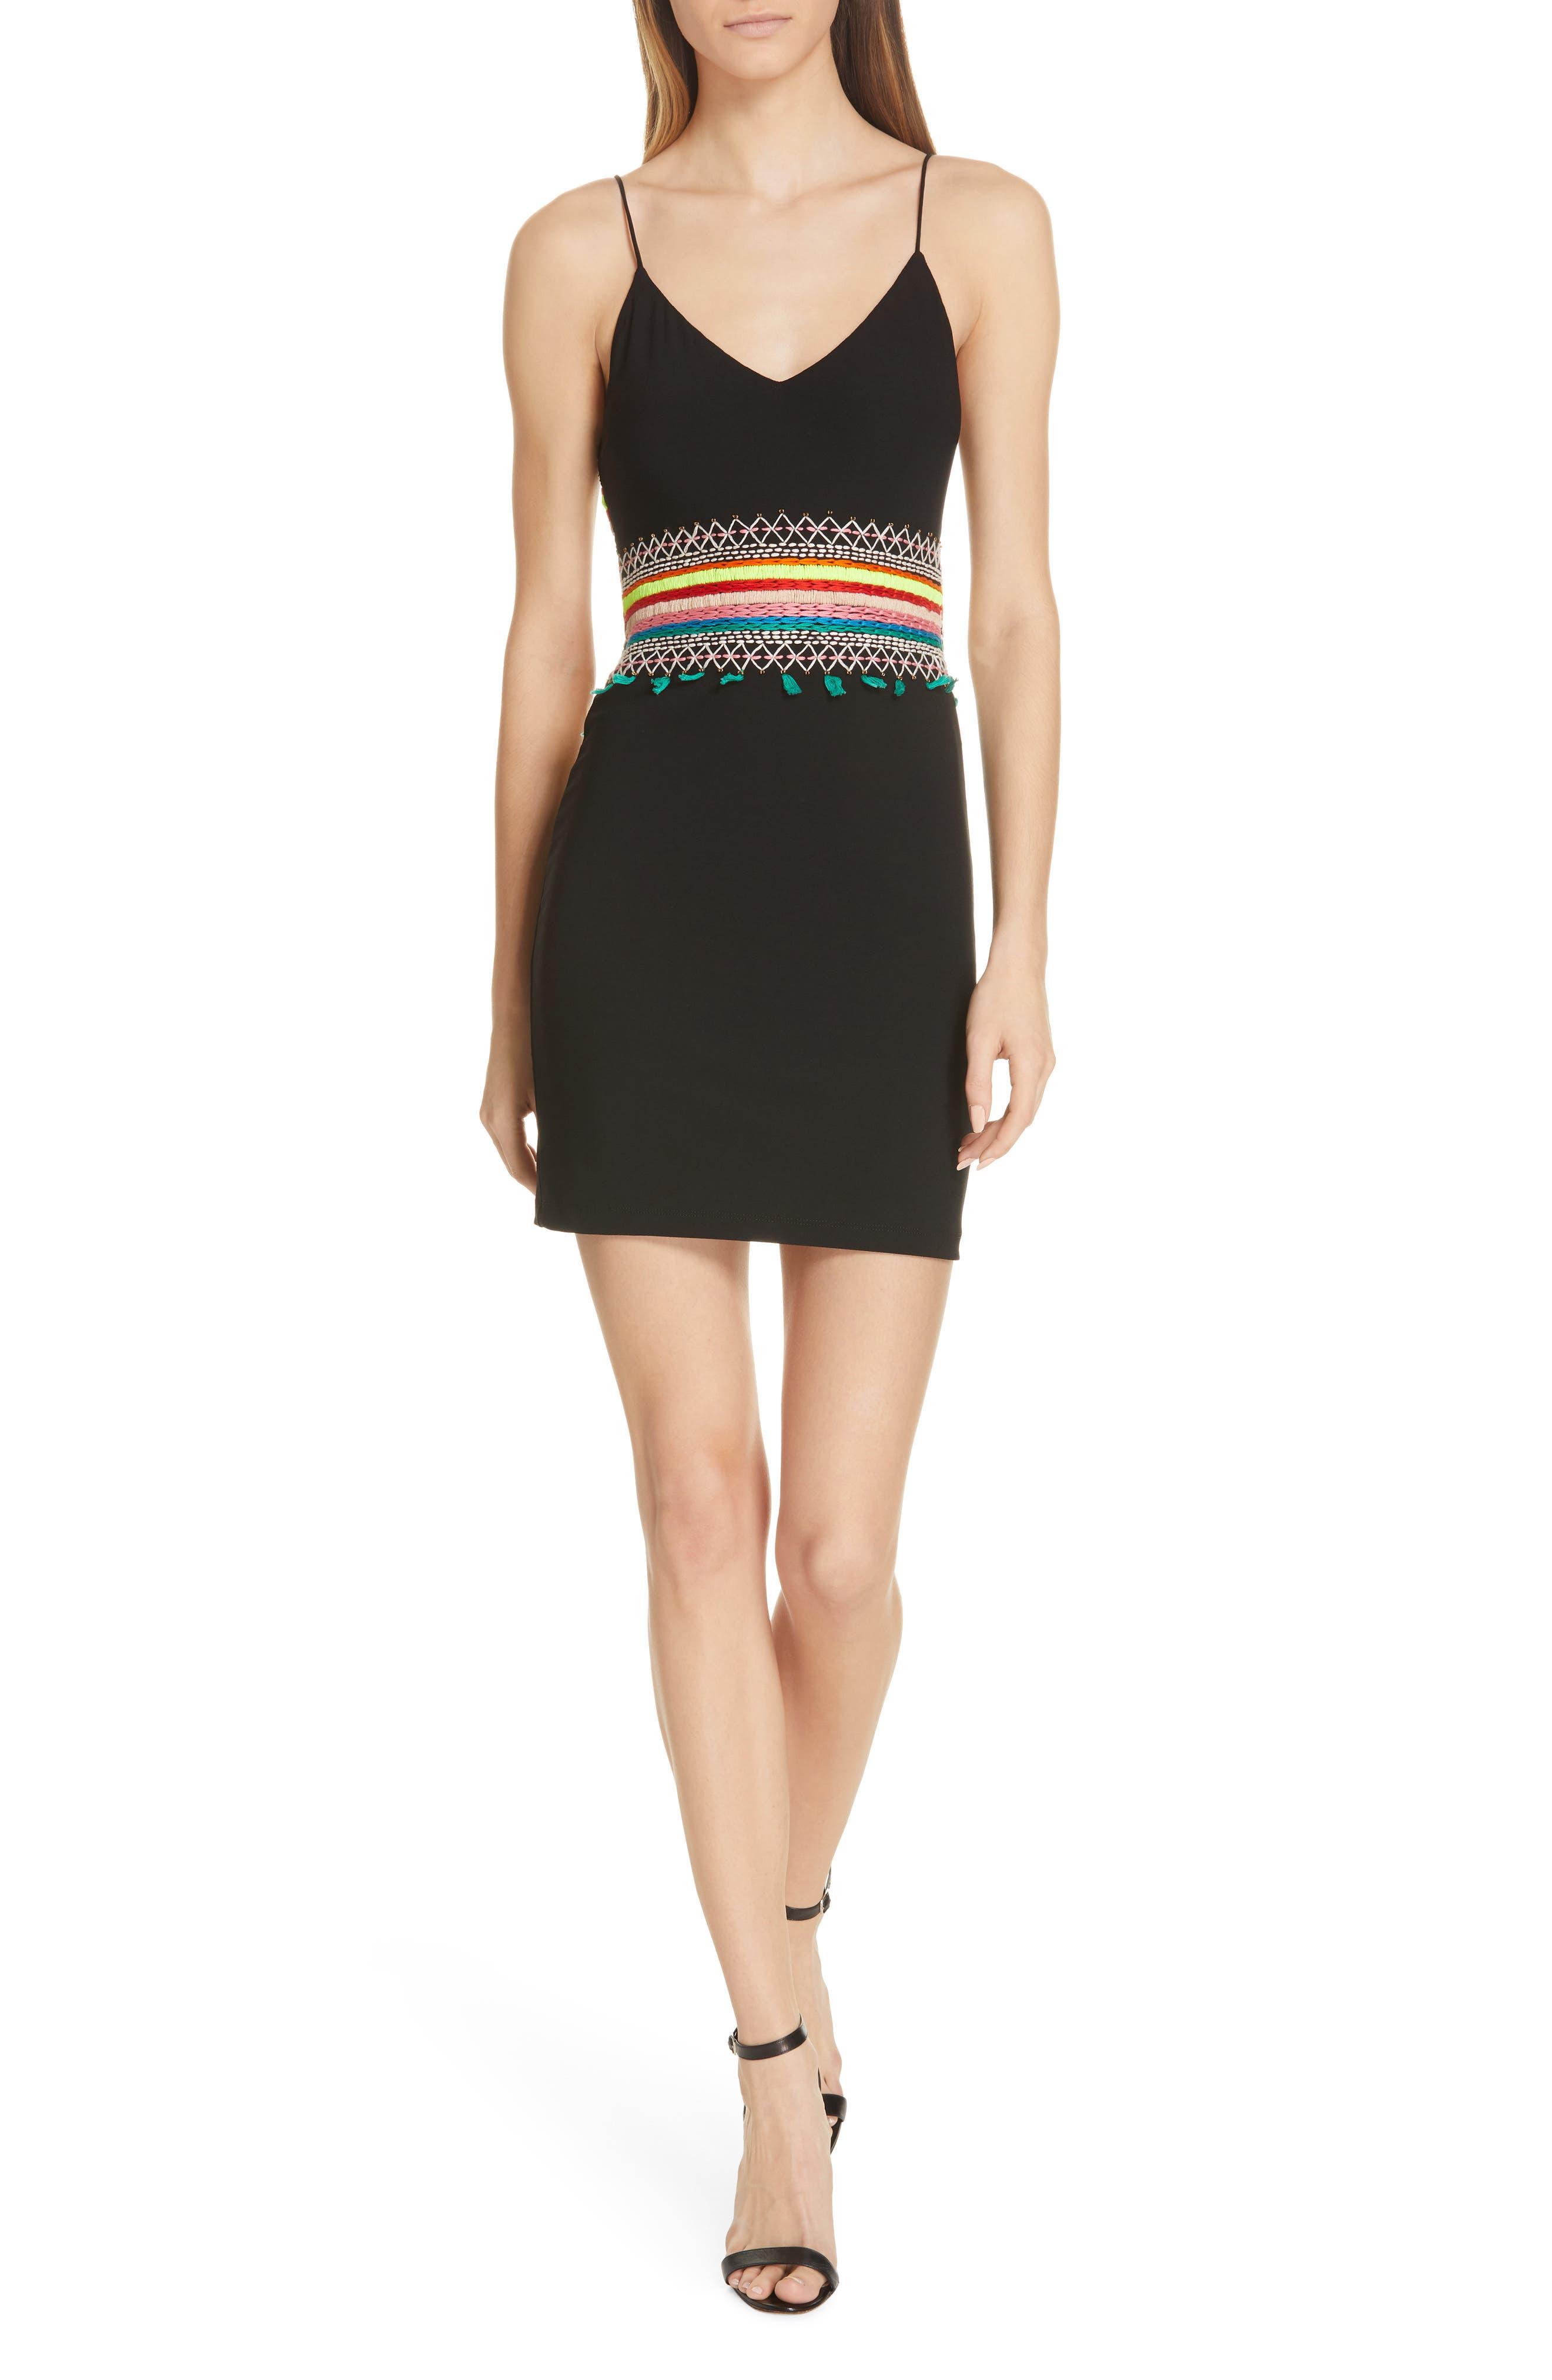 Alice + Olivia Loralee Embroidered Fitted Minidress, Black